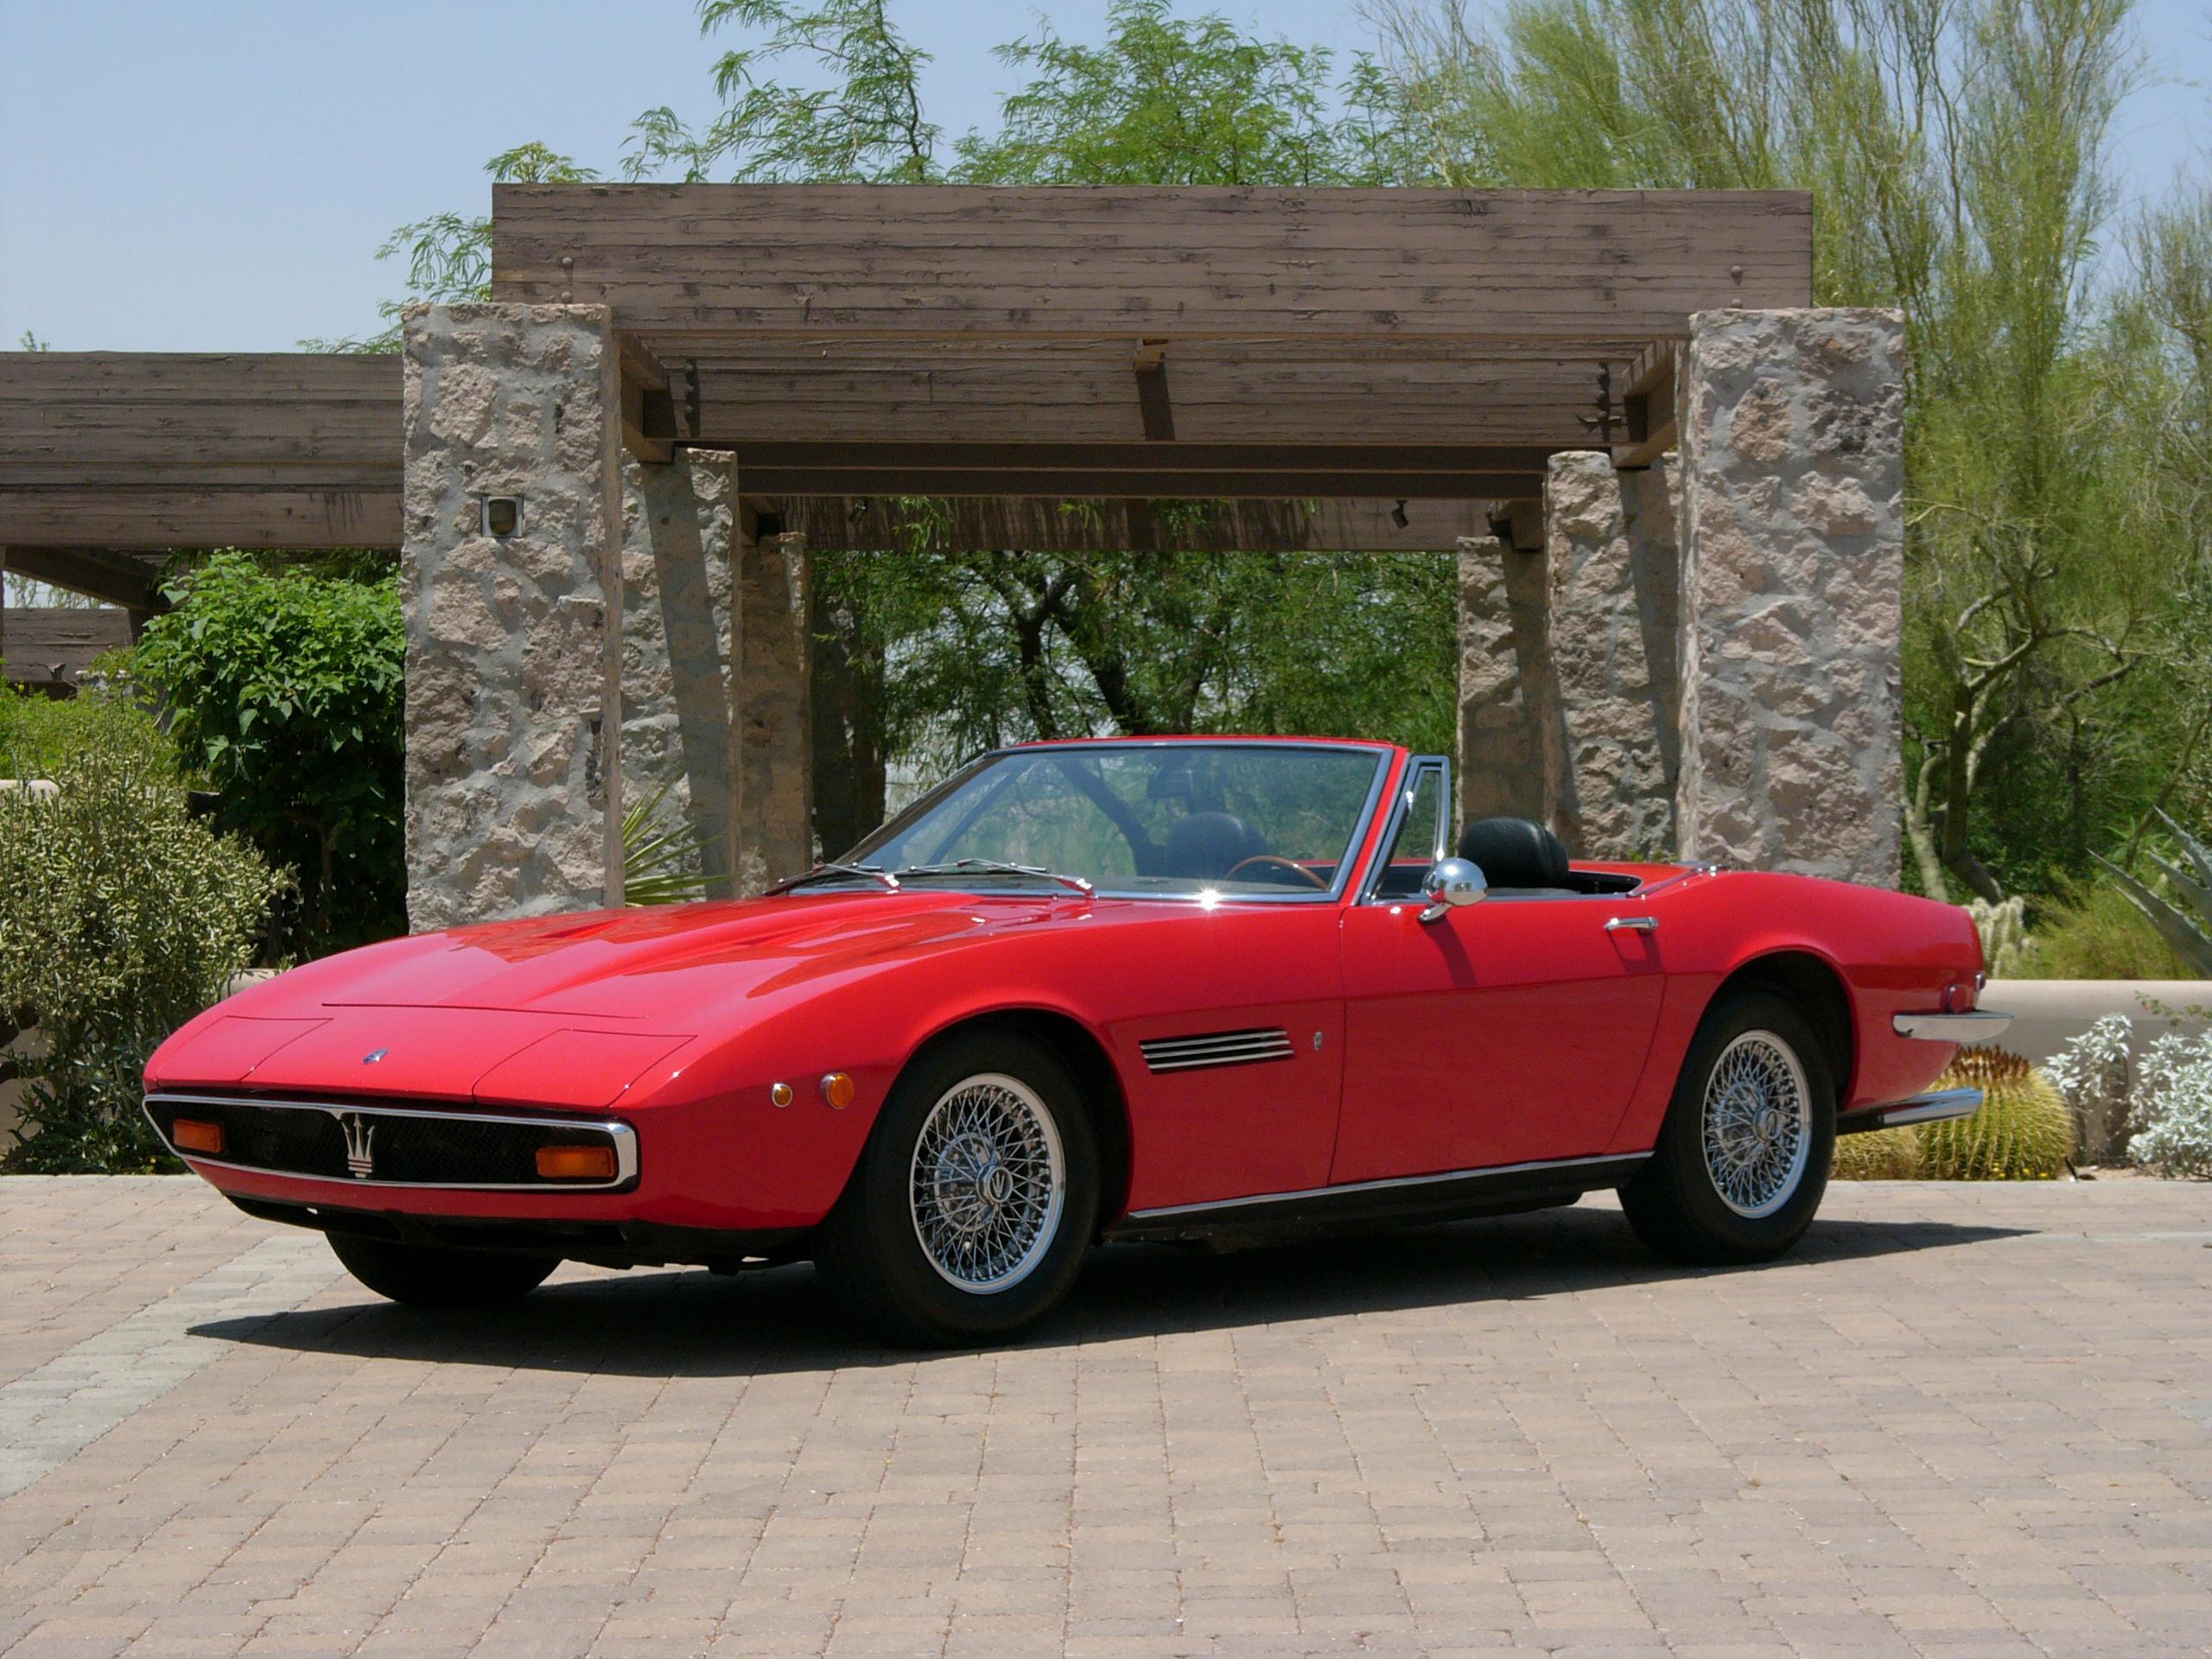 One of 100 produced 1970 Maserati Ghibli Spyder Coachwork by Ghia Chassis...